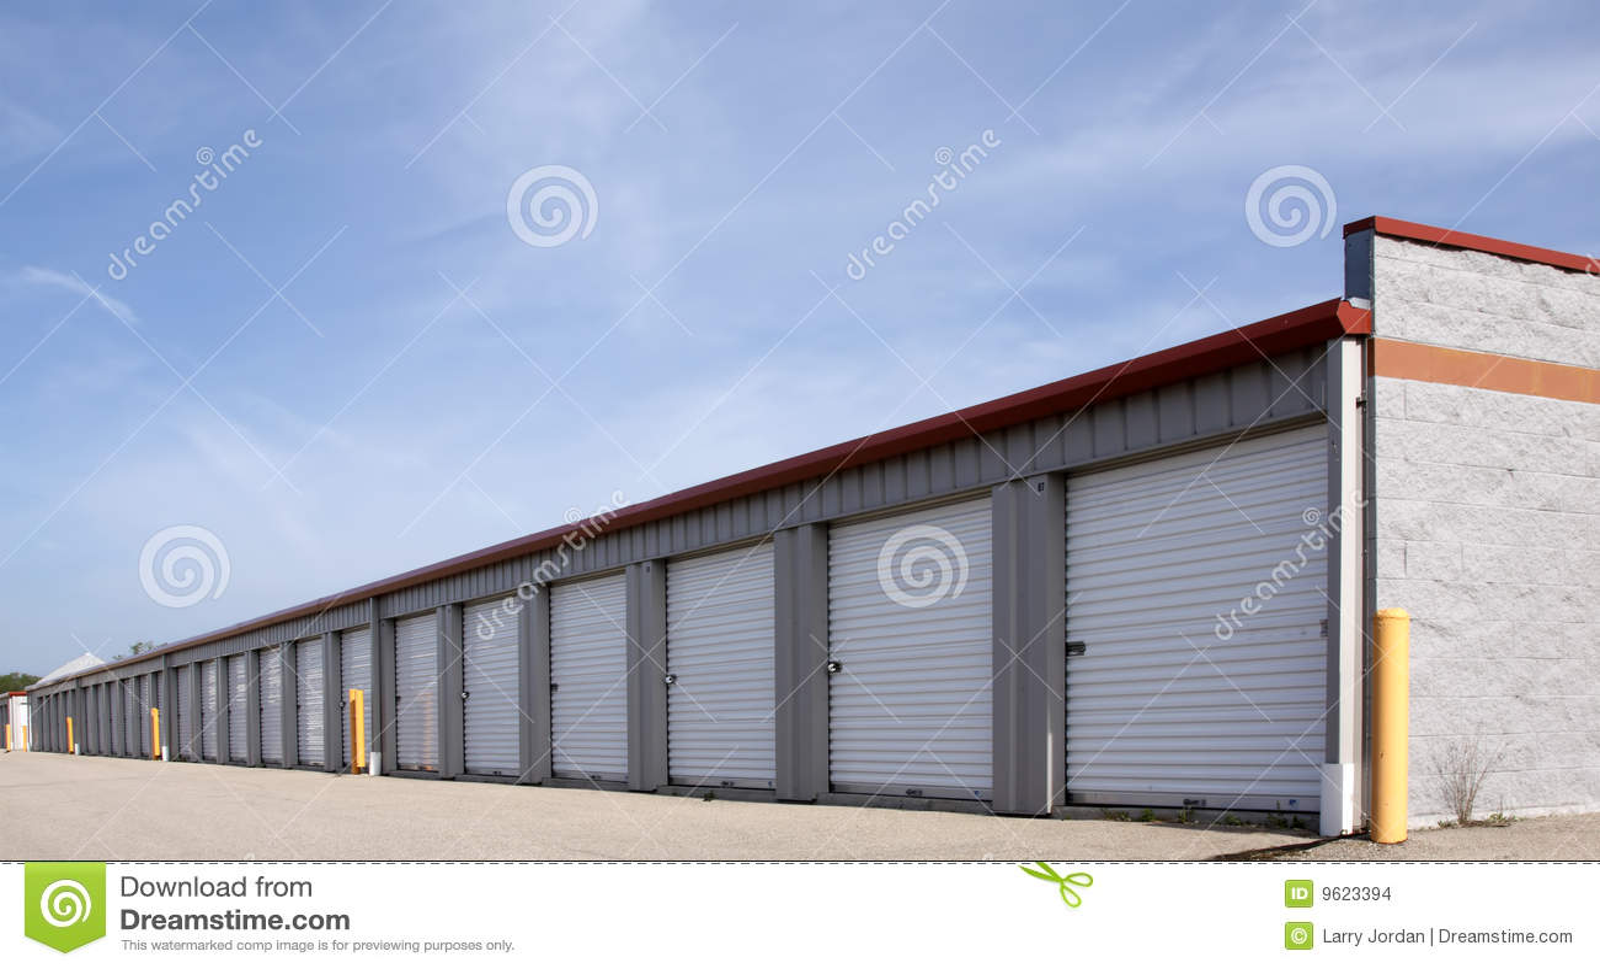 Rental Storage Units Stock Images Image 9623394